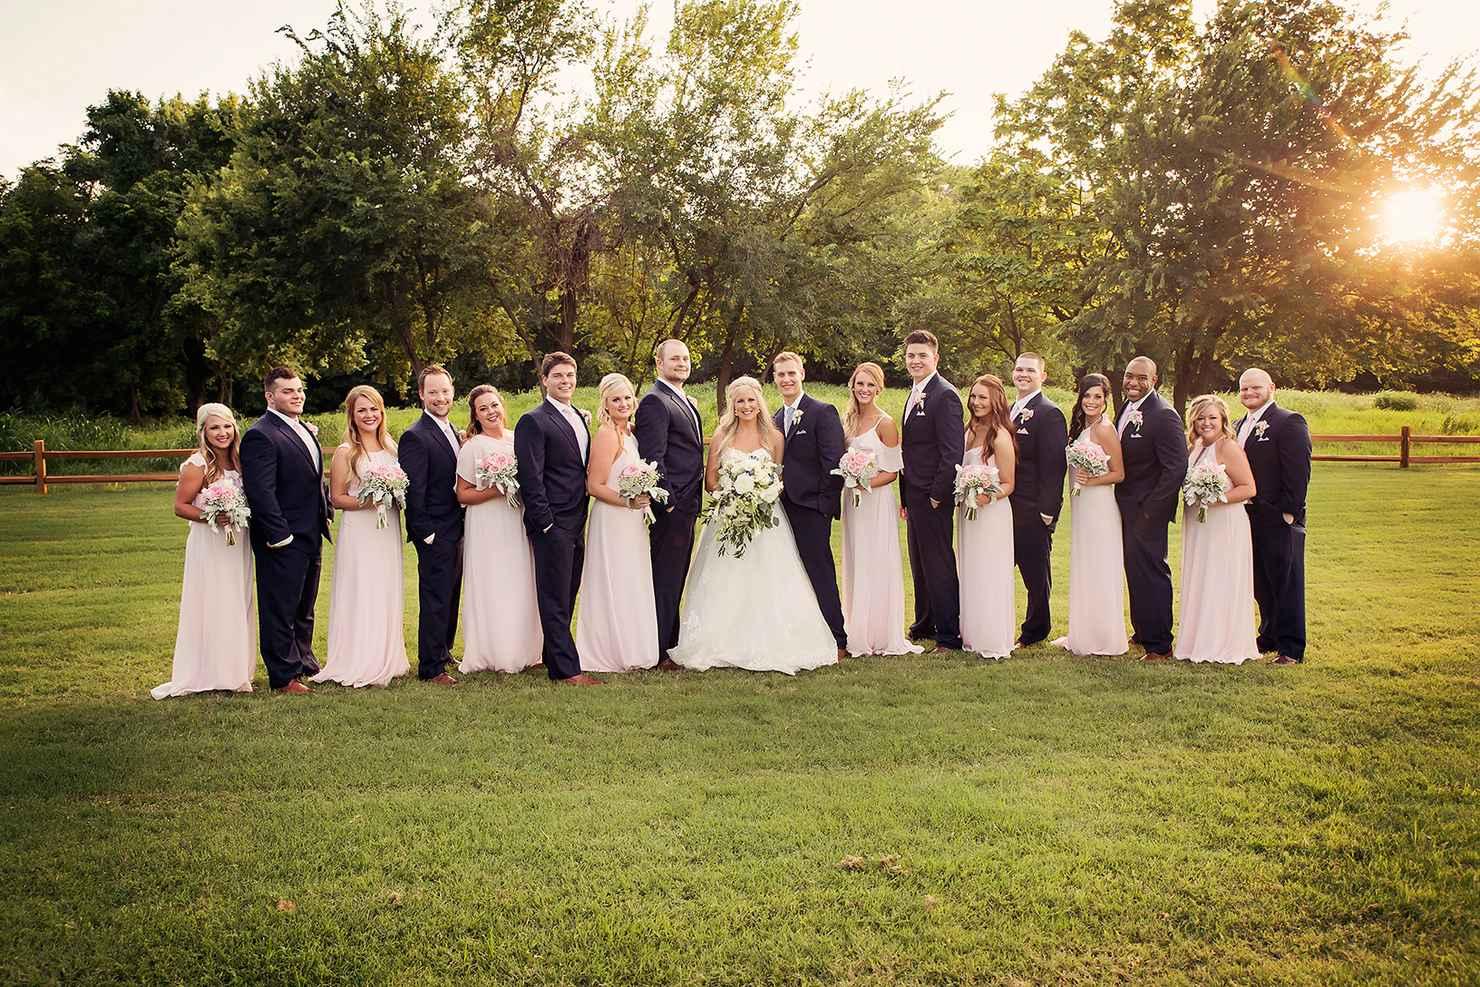 Ivory bridesmaids